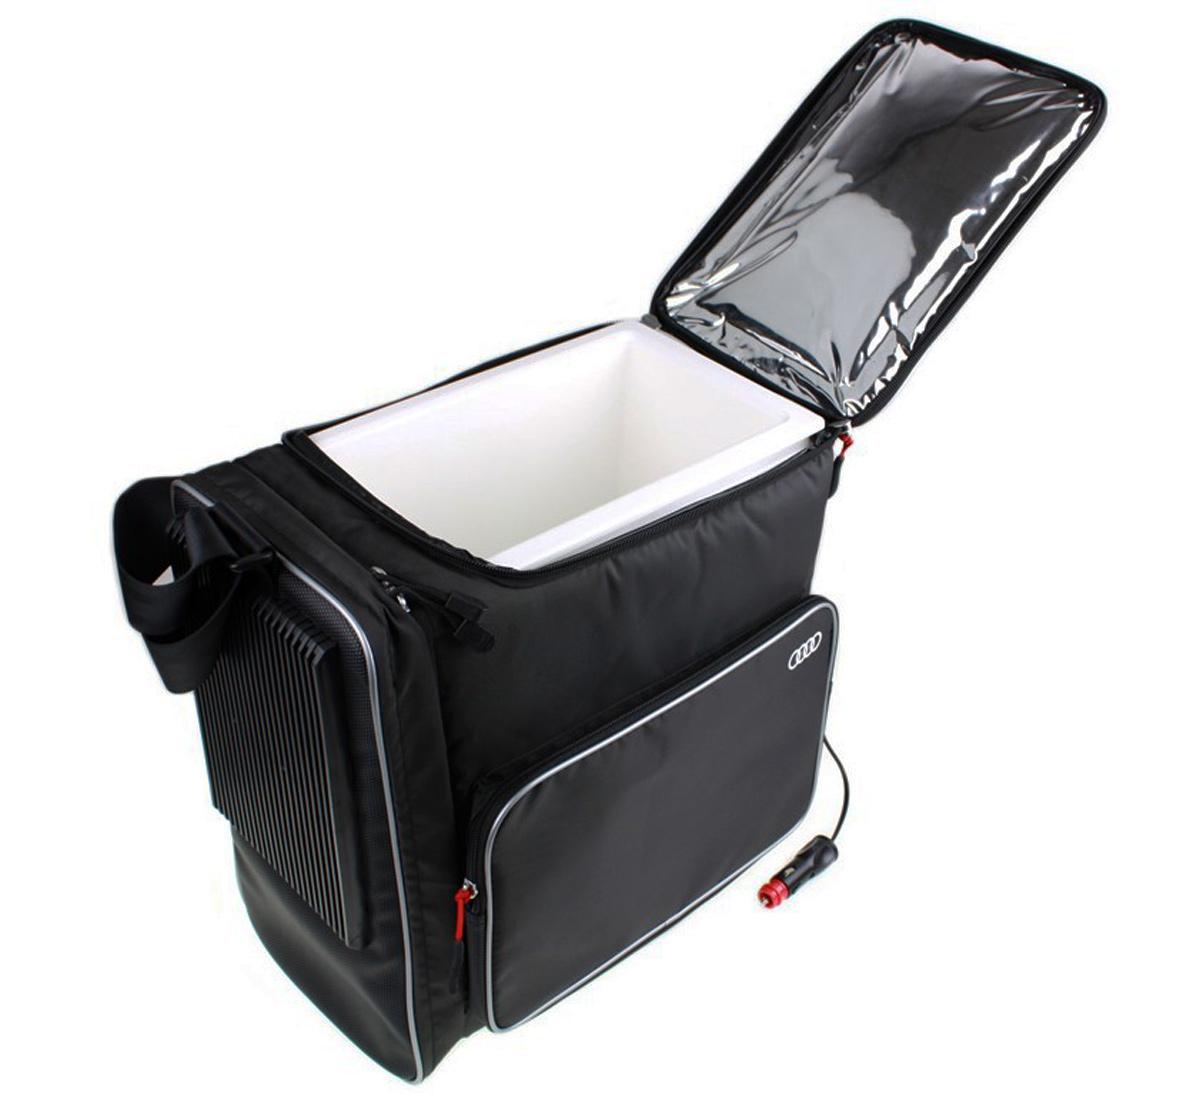 neu audi original k hlbox 12 liter k hltasche 12v a1 a3 a4 a5 a6 a7 a8 4l0065402 ebay. Black Bedroom Furniture Sets. Home Design Ideas